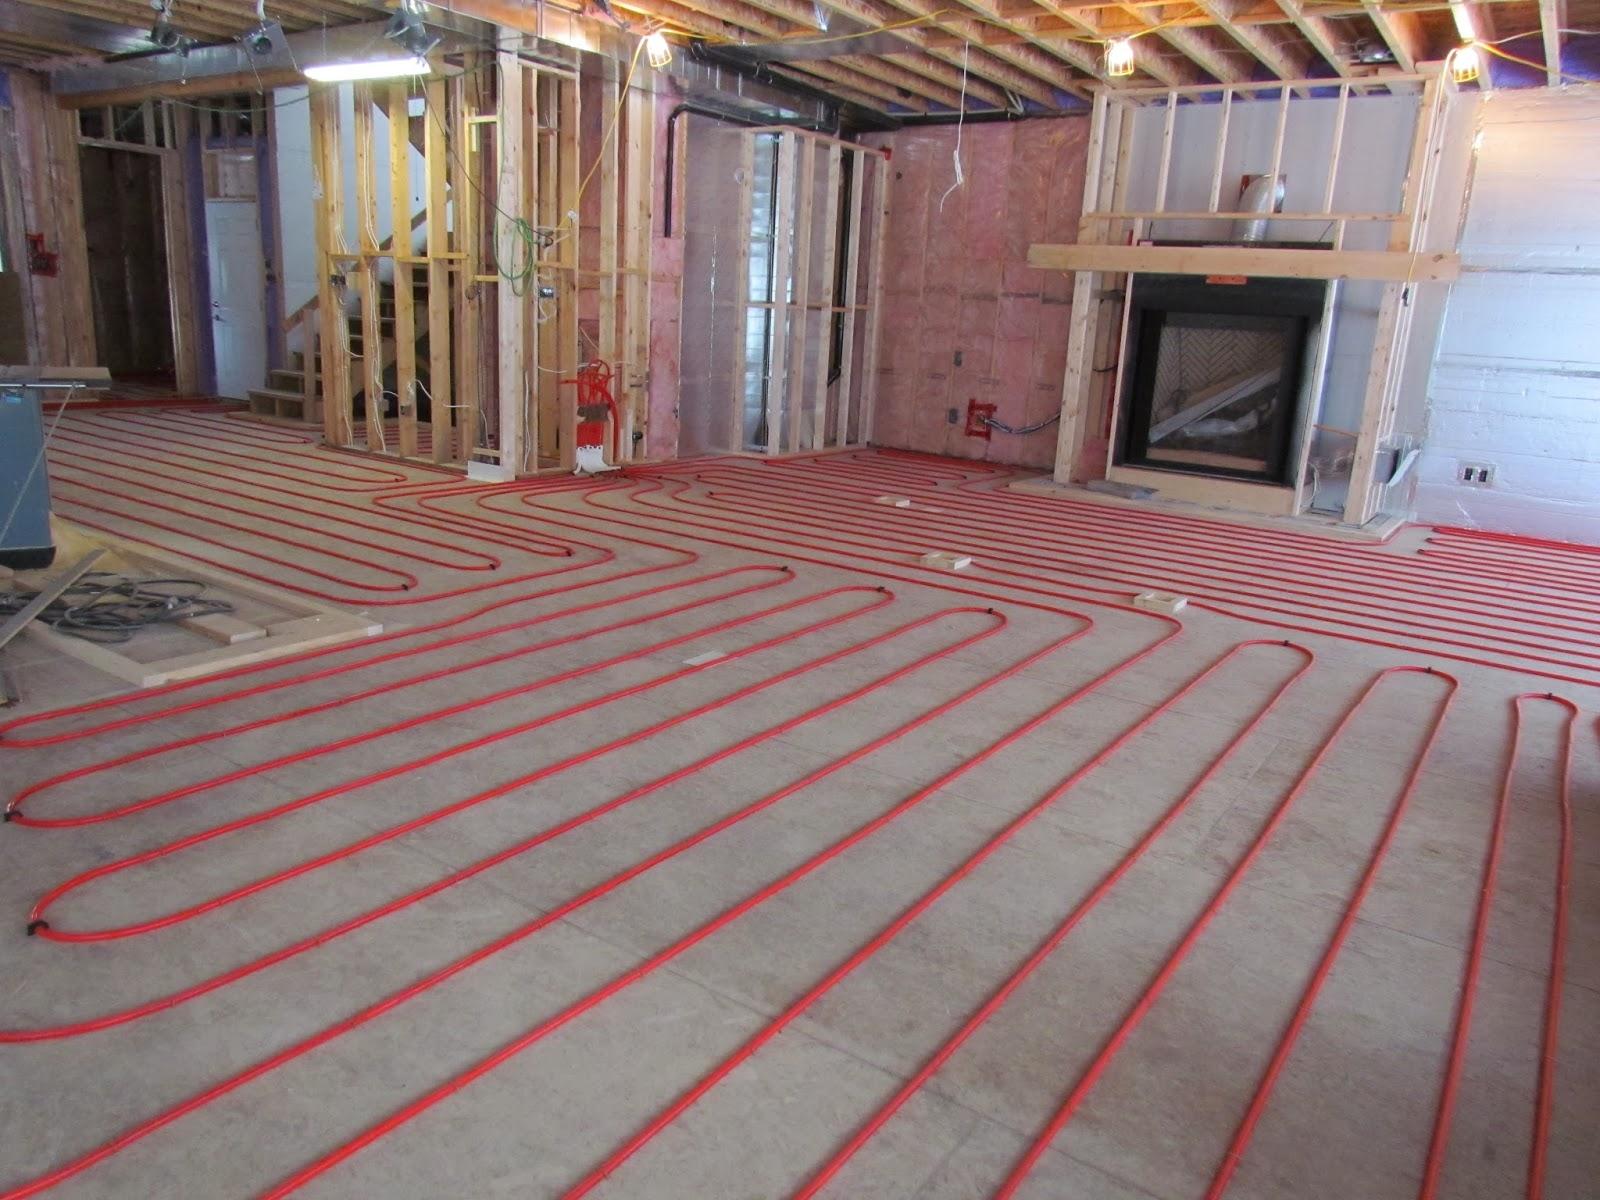 Electric Radiant Floor Heating Basementask rob radiant in floor heating in the basement